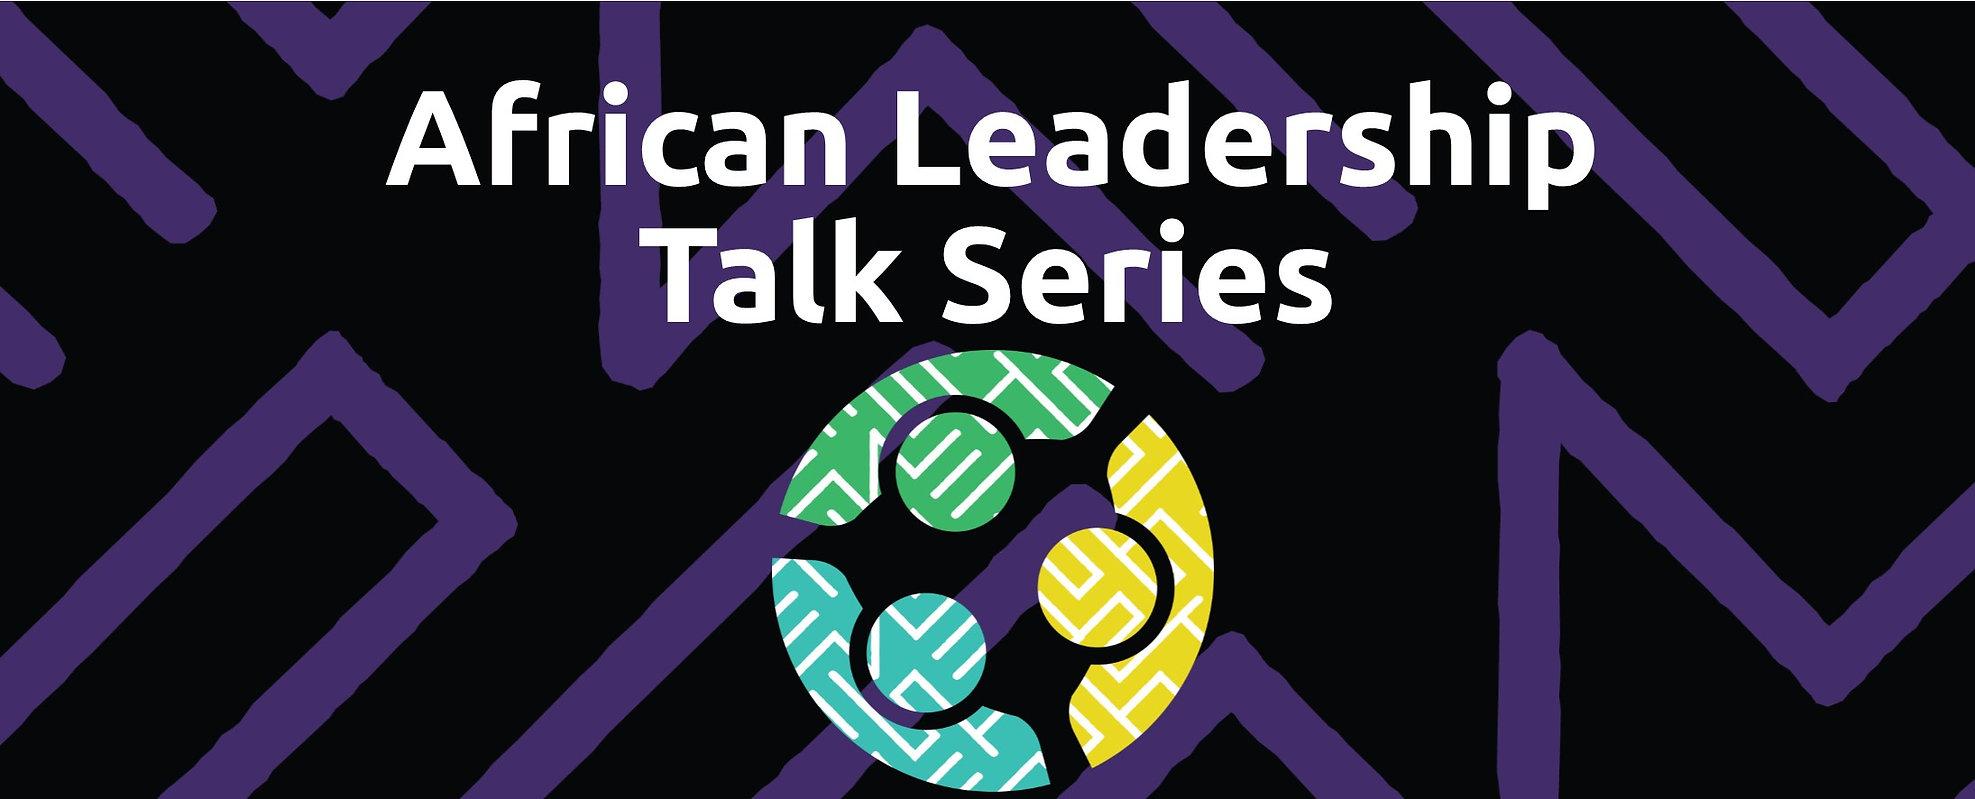 African Leadership Image w Text.jpg